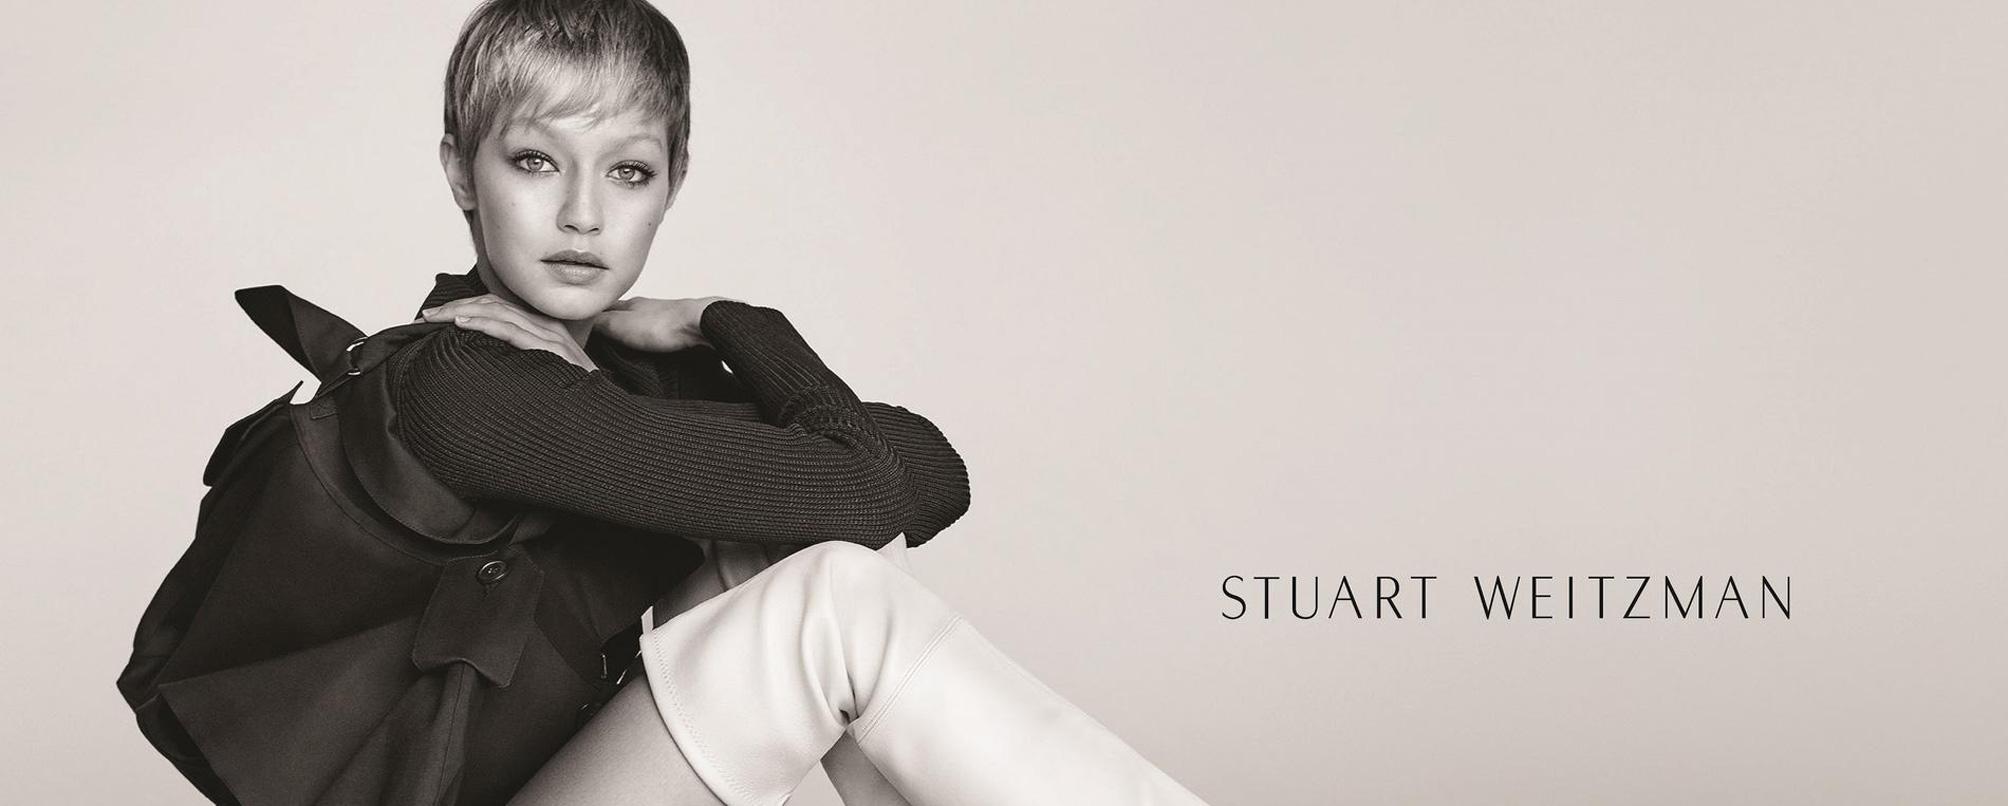 Debut Rambut Pixie Gigi Hadid dalam Kampanye Stuart Weitzman